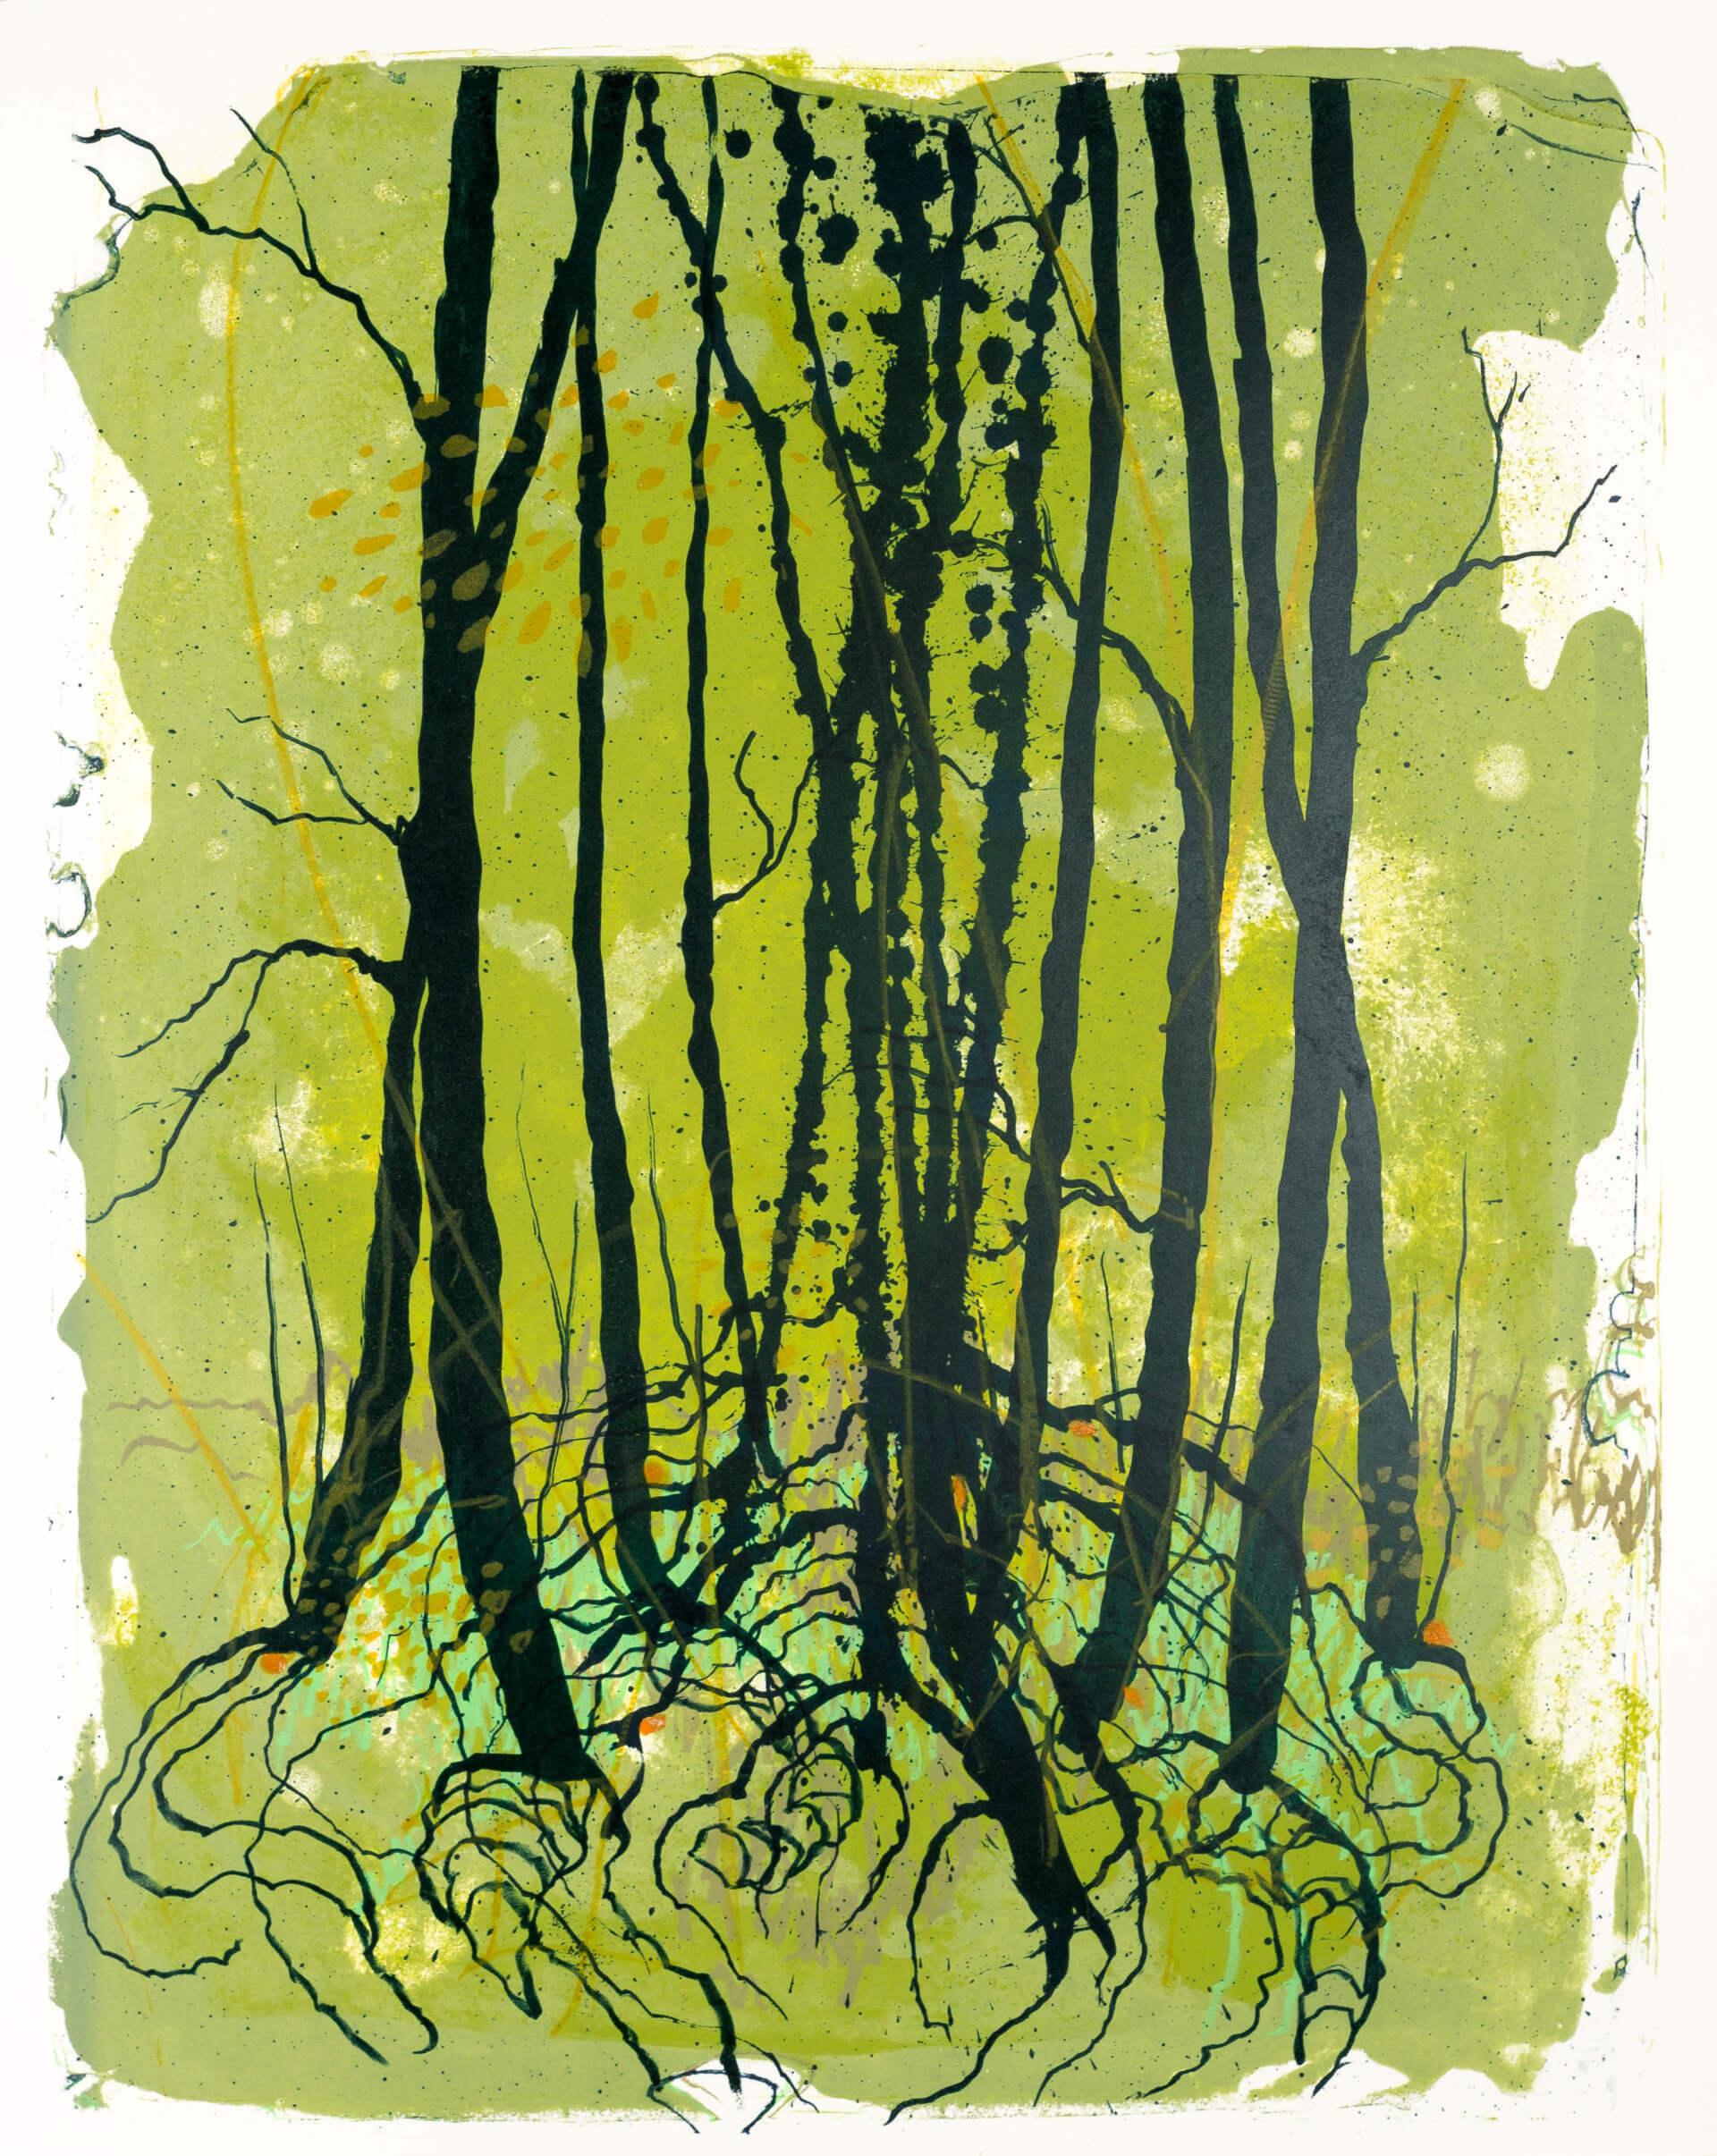 Wald X(D)-V, 2019, Farblithographie, Unikat, 50x40 cm